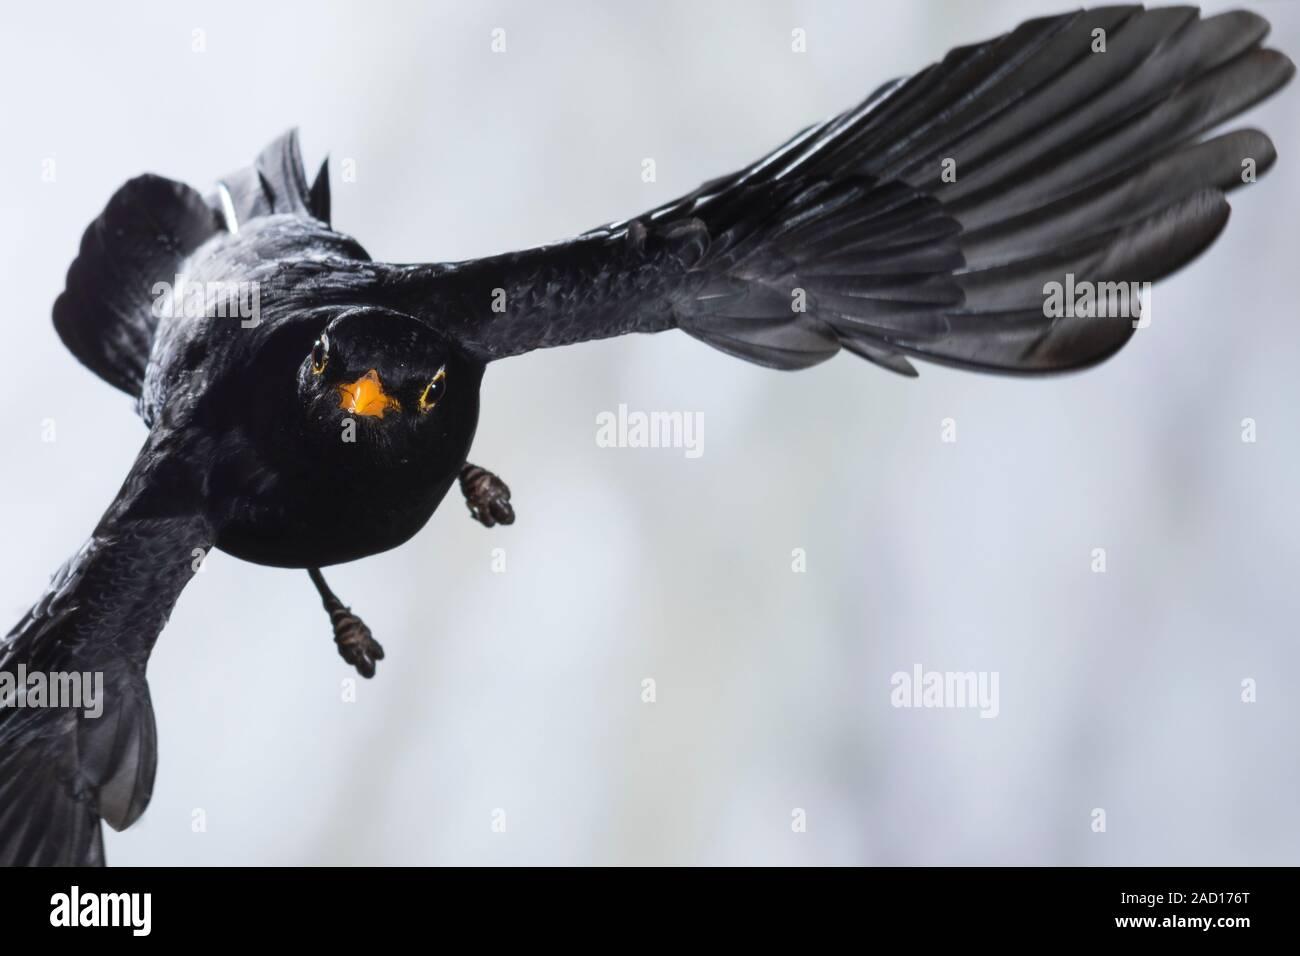 Amsel, Schwarzdrossel, Männchen, Flug, Flugbild, fliegend, Turdus merula, Blackbird, male, flight, flying, Merle noir Stock Photo